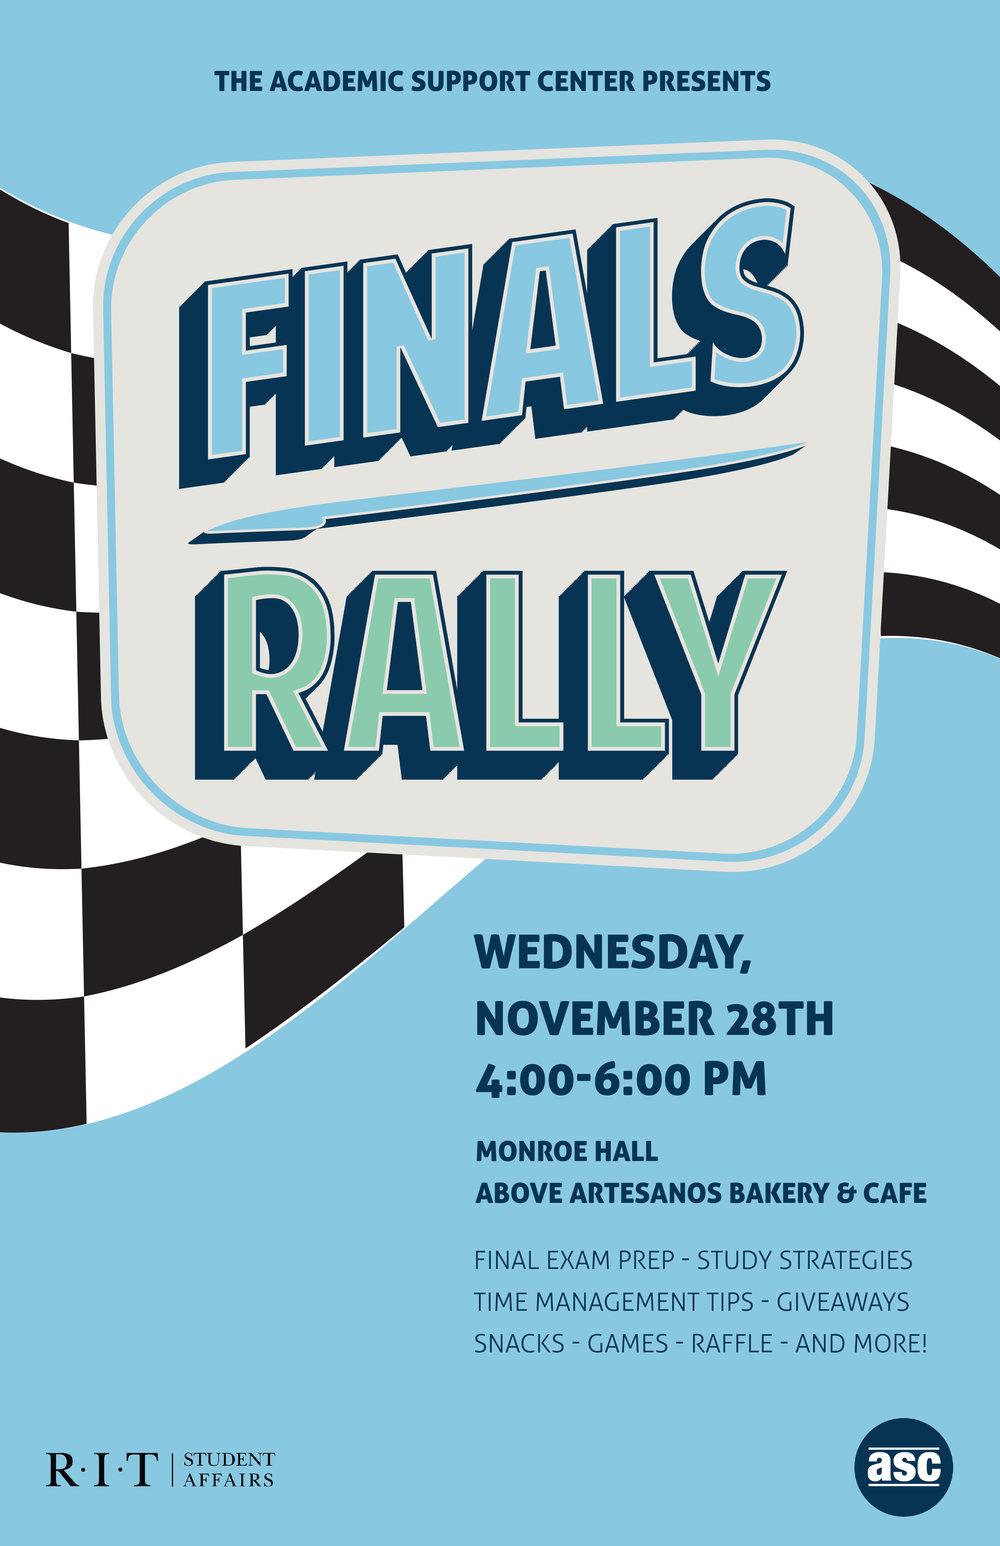 Finals Rally Poster.jpg